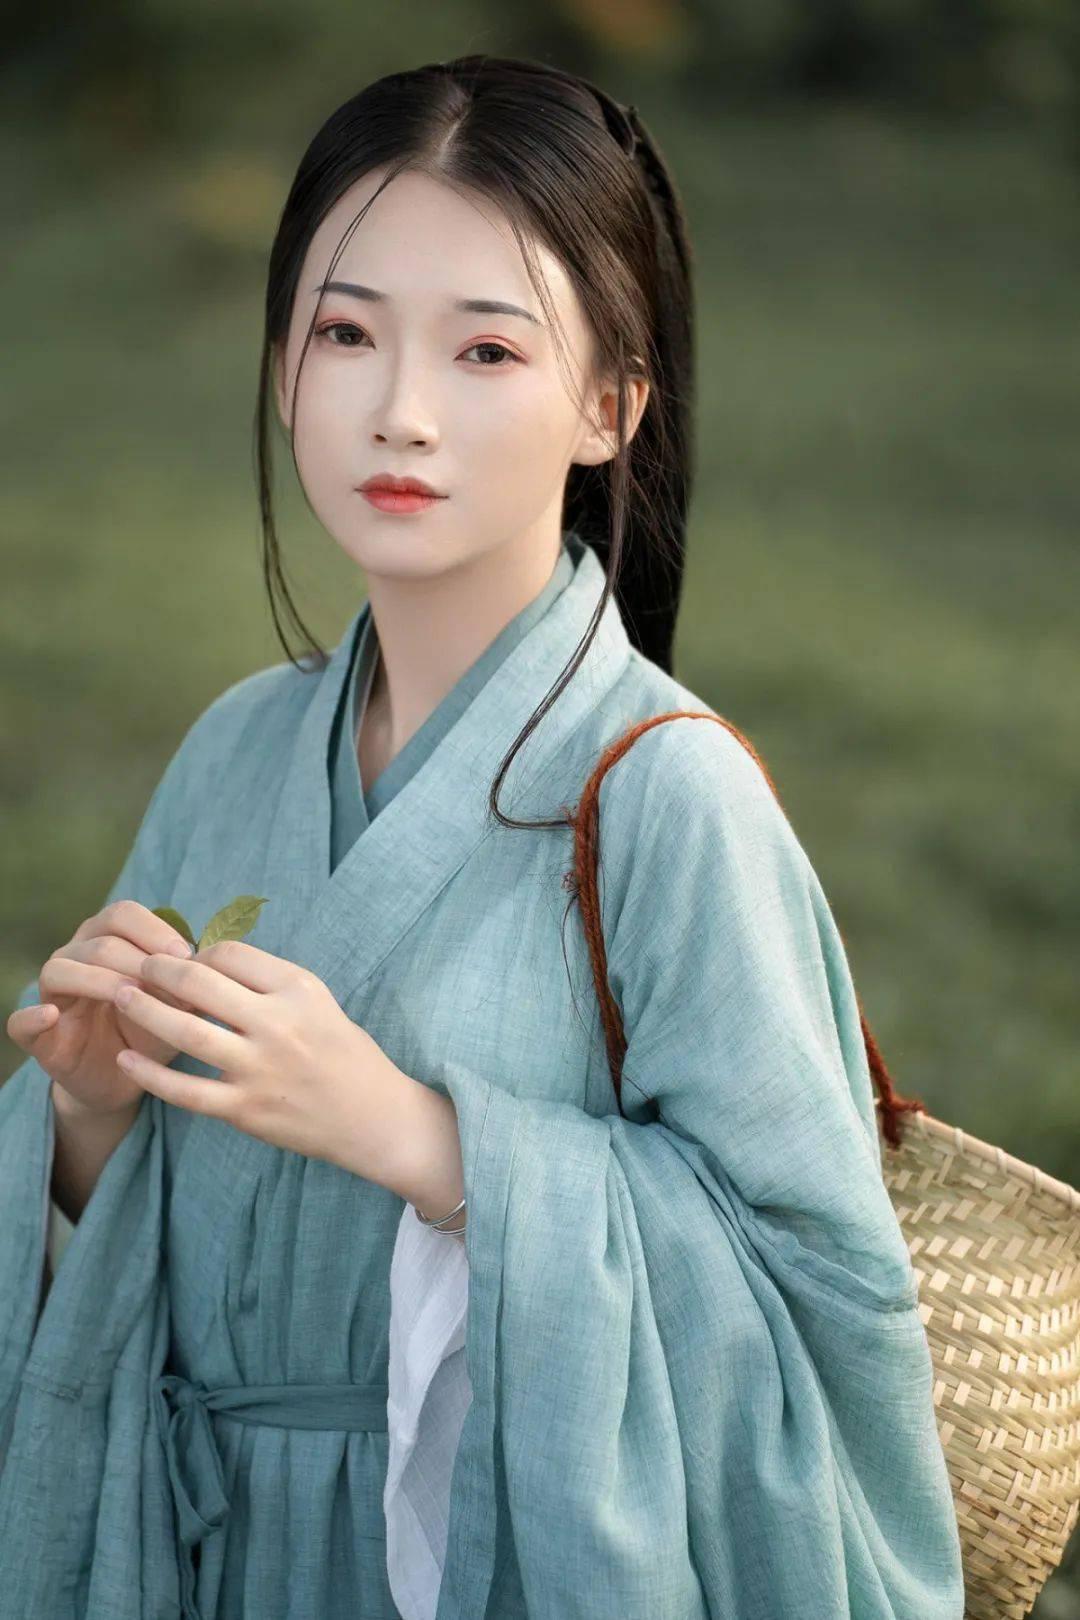 uc下一页:烟染岁月,春情如婳 网络快讯 第2张